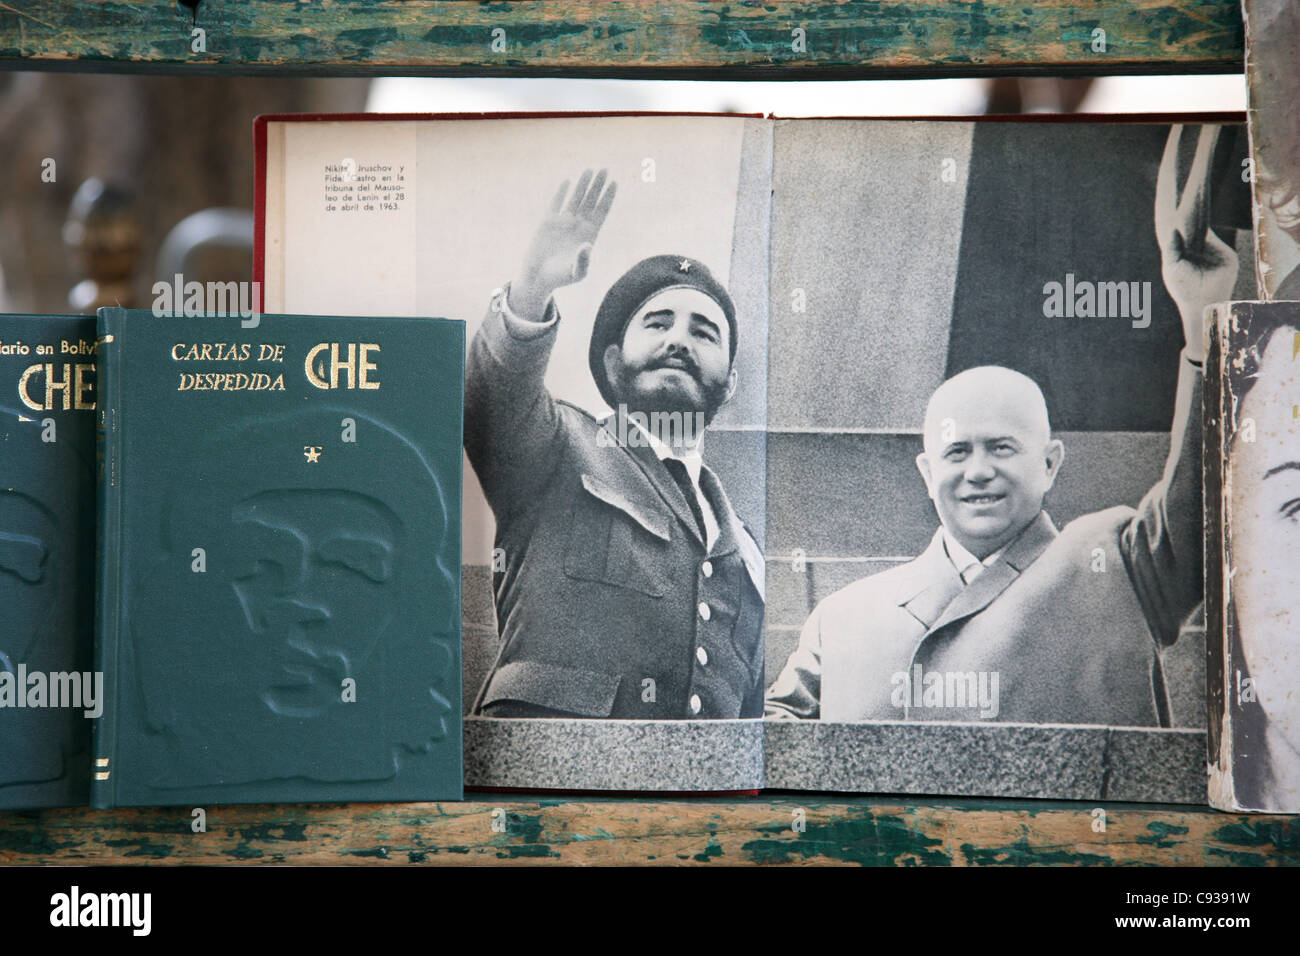 Fidel Castro and Soviet leader Nikita Khrushchev seen in a book at the book market at Plaza de Armas in Havana, - Stock Image